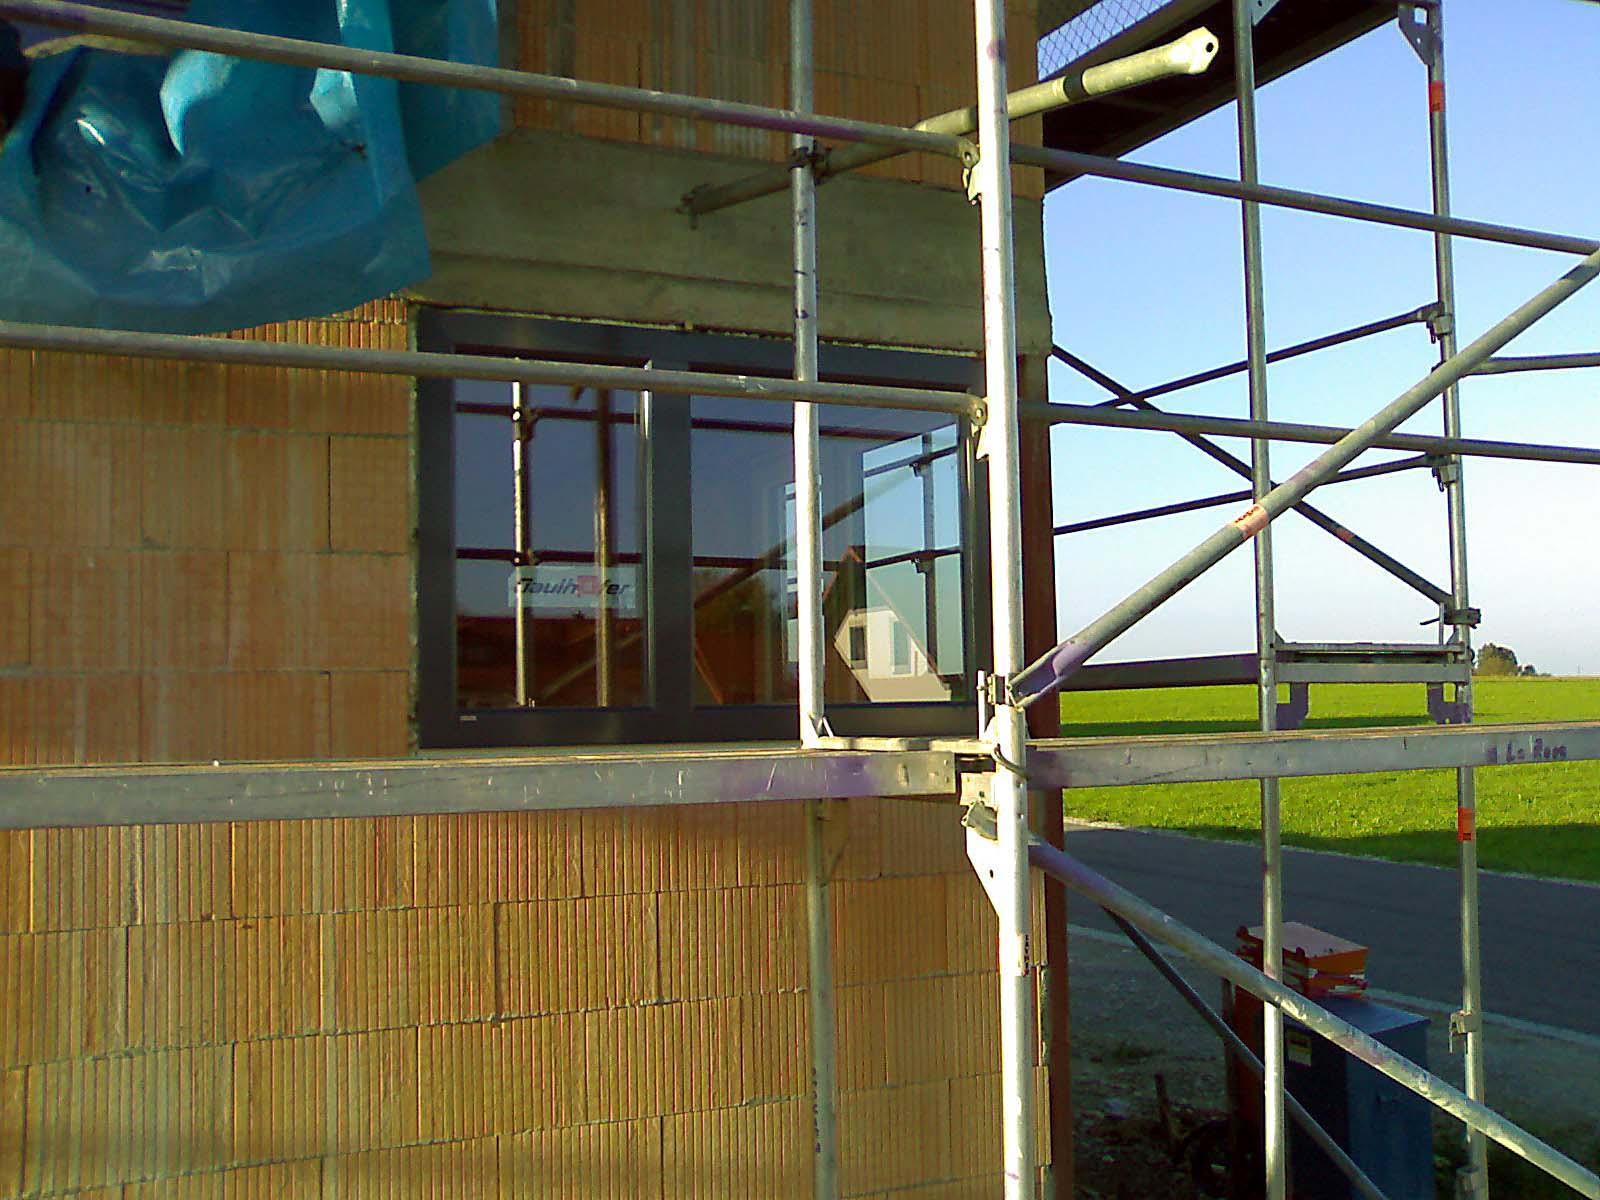 Eckfenster innenansicht  BauBlog » Blog Archive » Fenster!